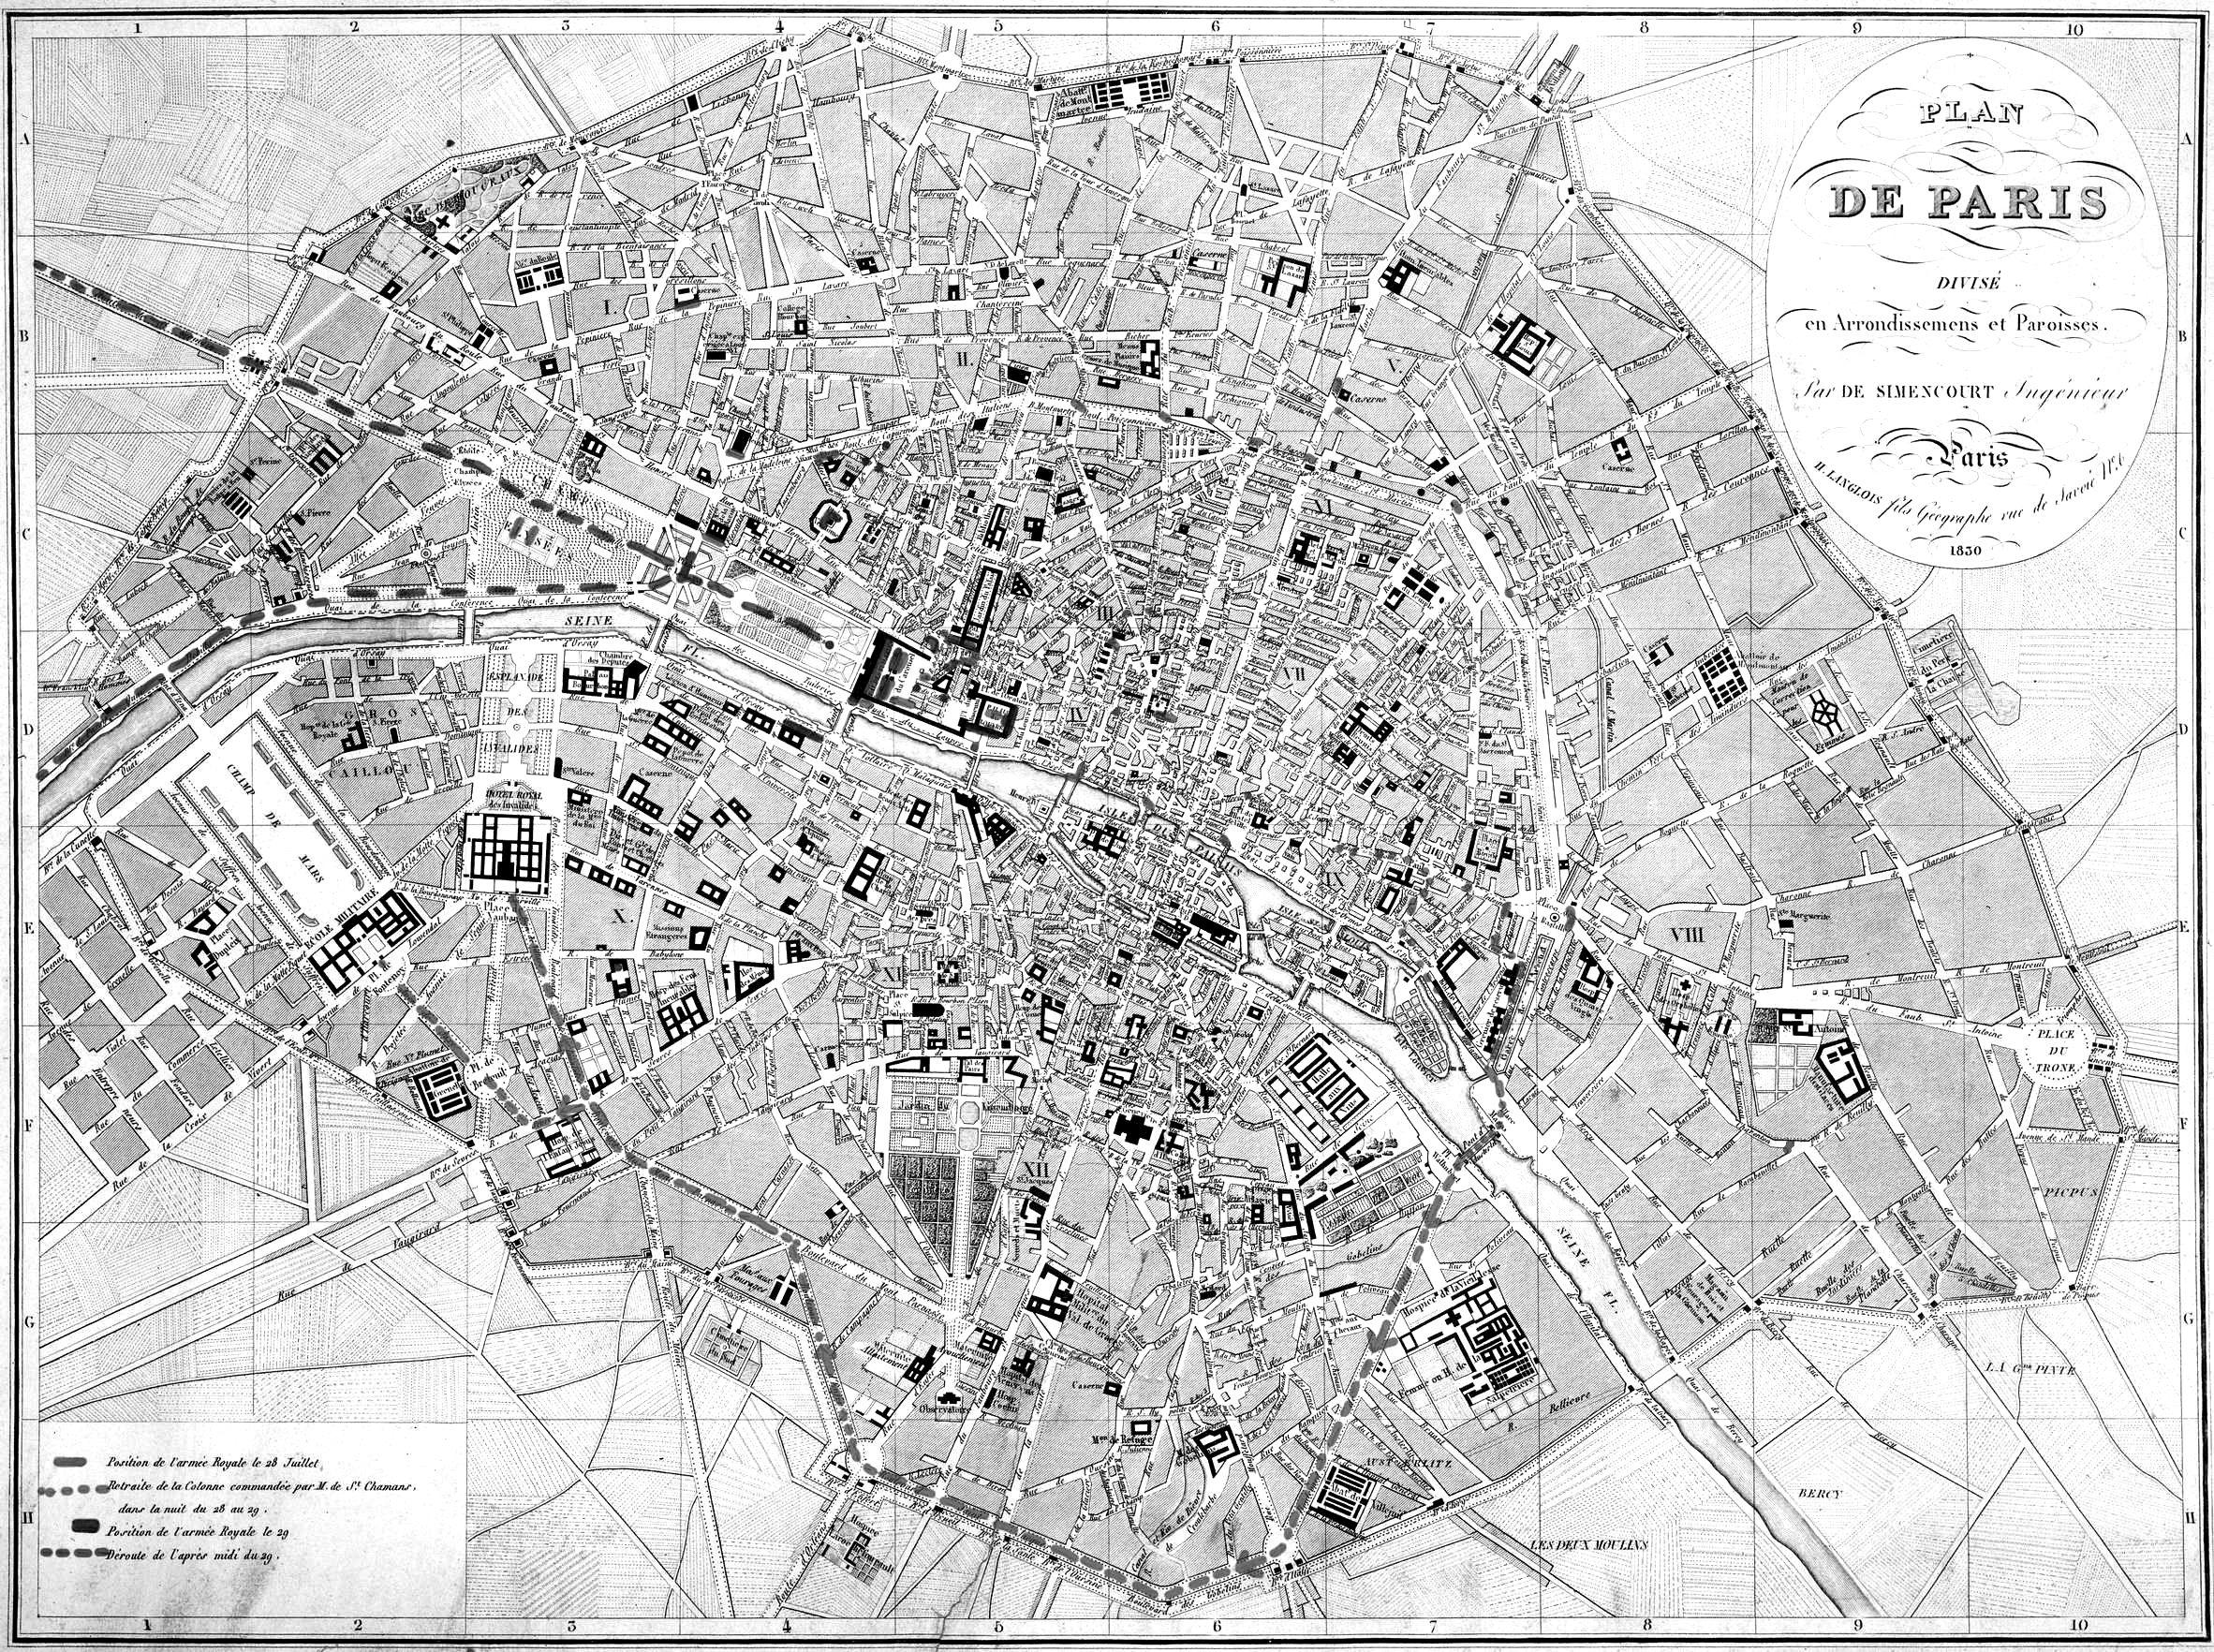 Map Of Paris By De Simencourt